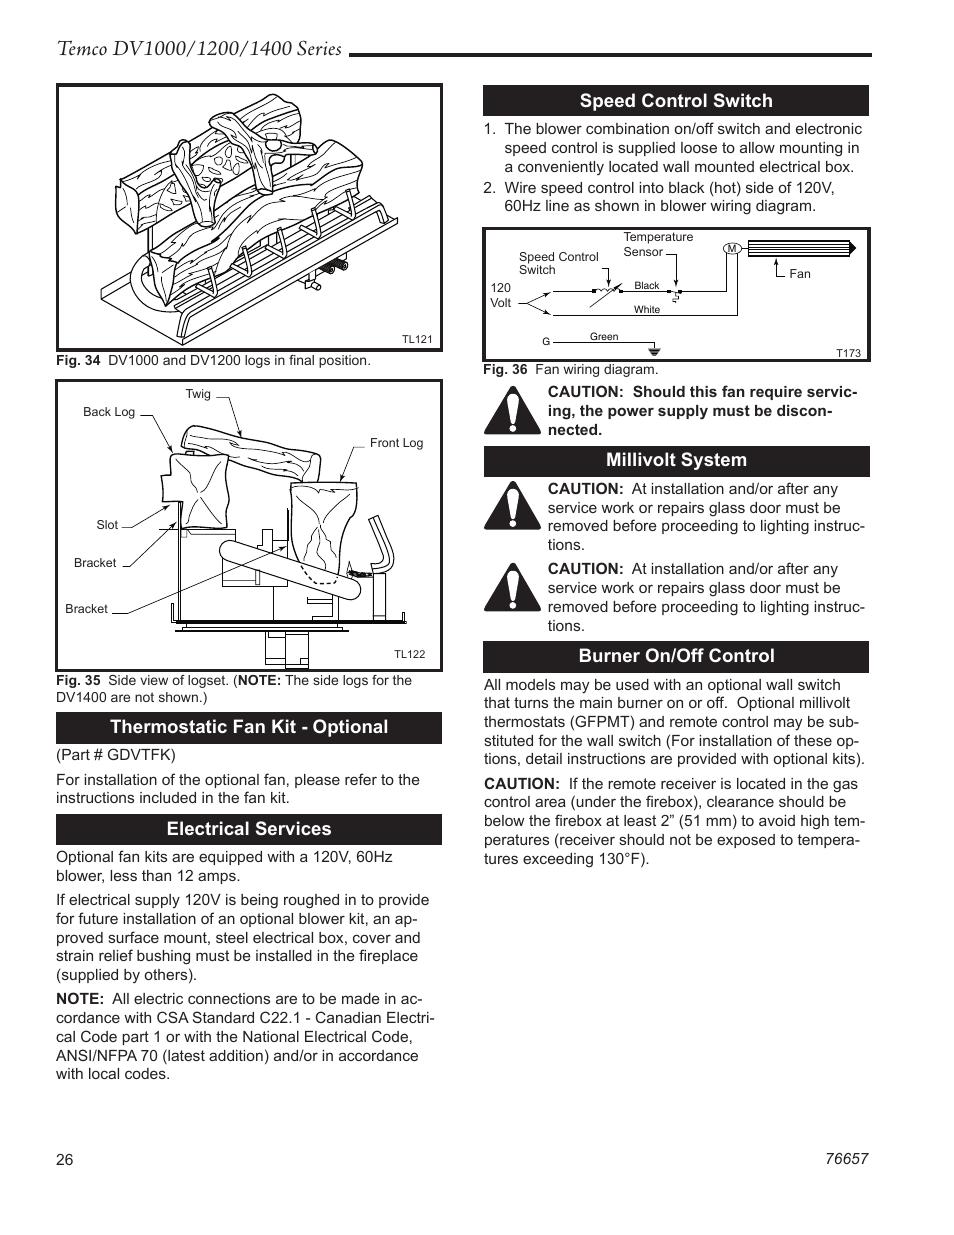 thermostatic fan kit